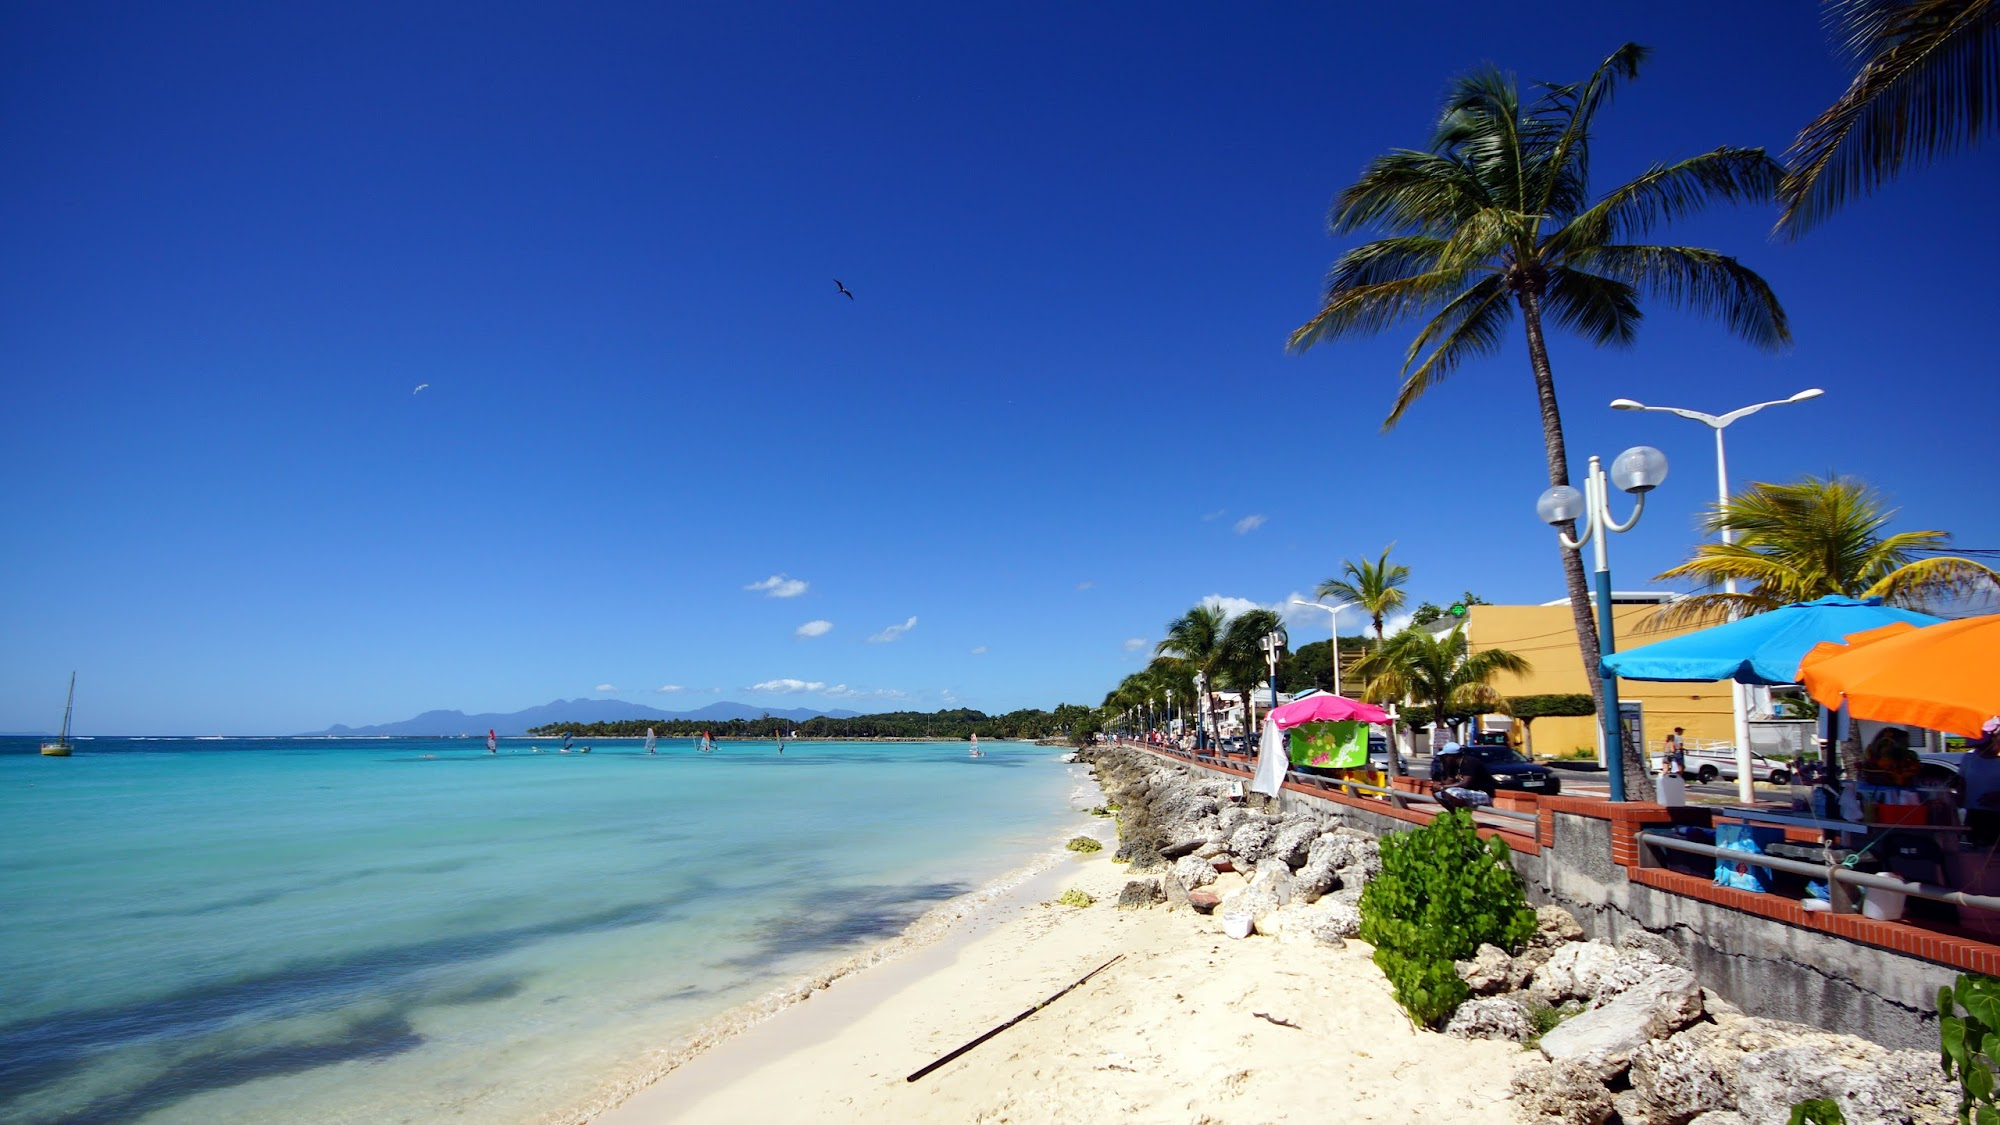 Reisinformatie Guadeloupe